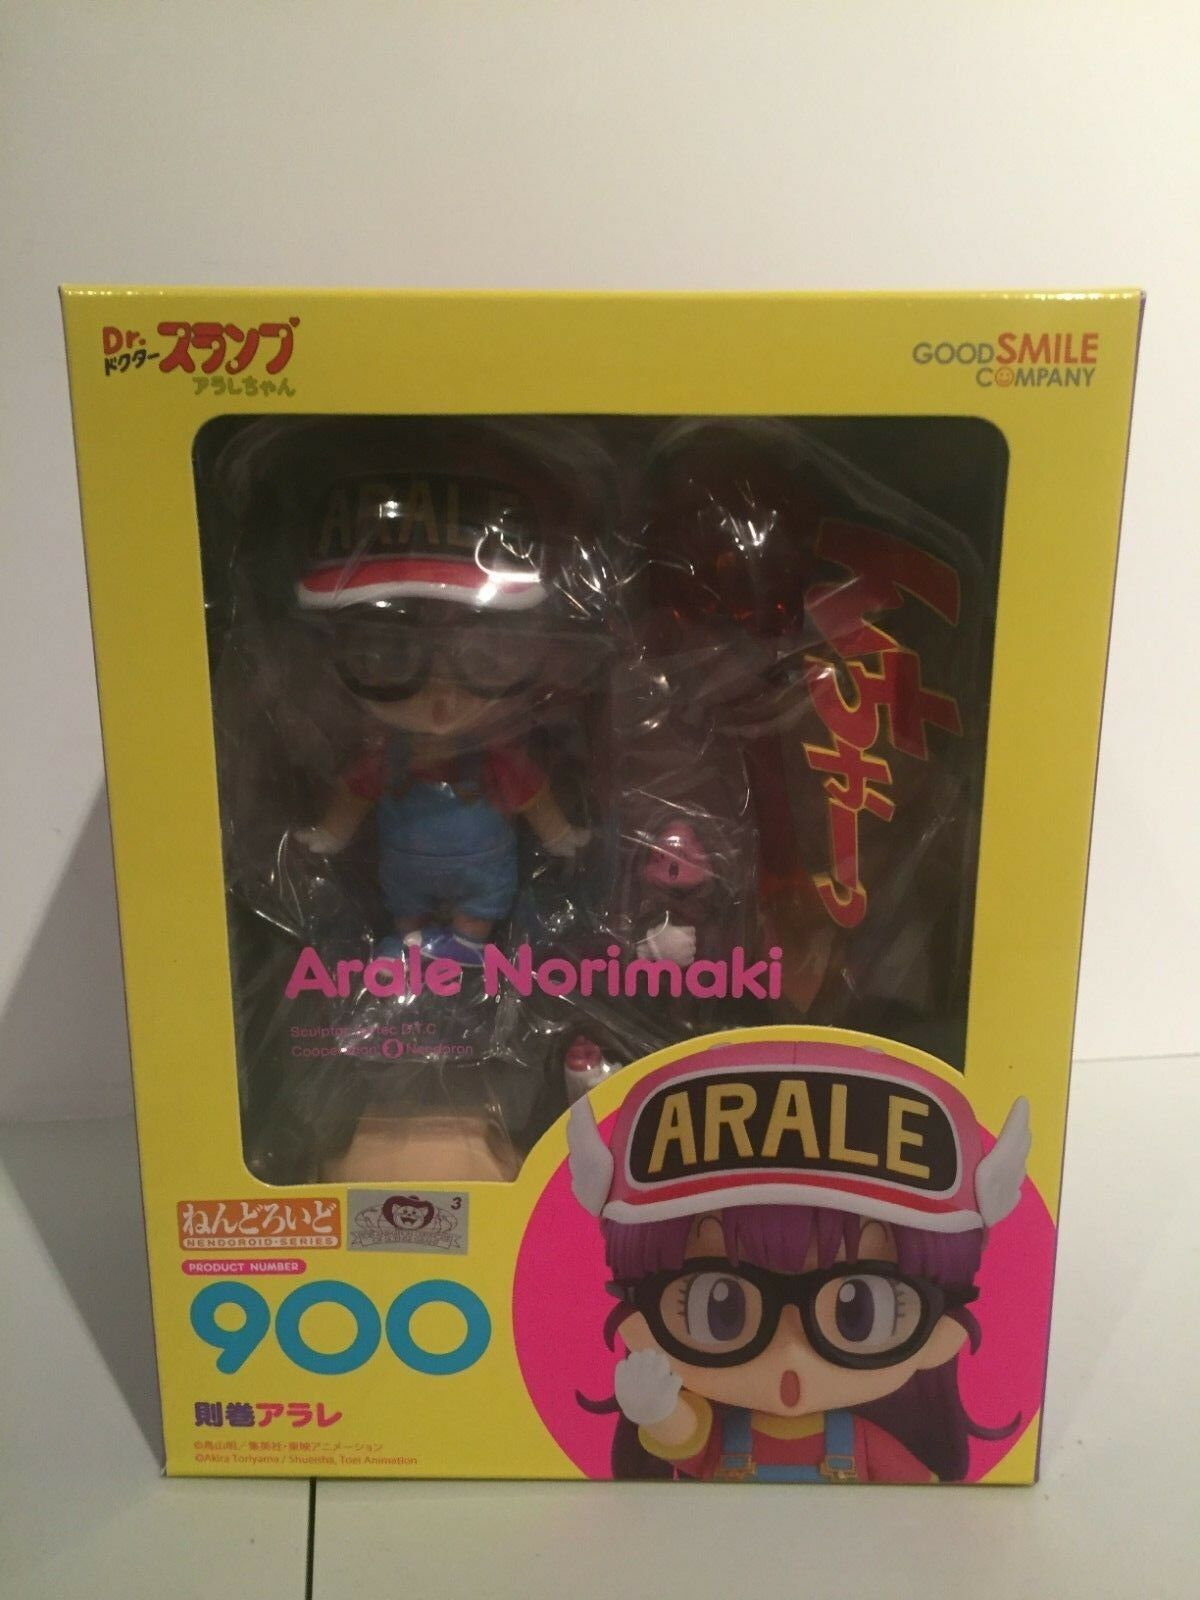 Nendgoldid figure   Arale Norimaki from Dr. Slump   New in box by Good Smile